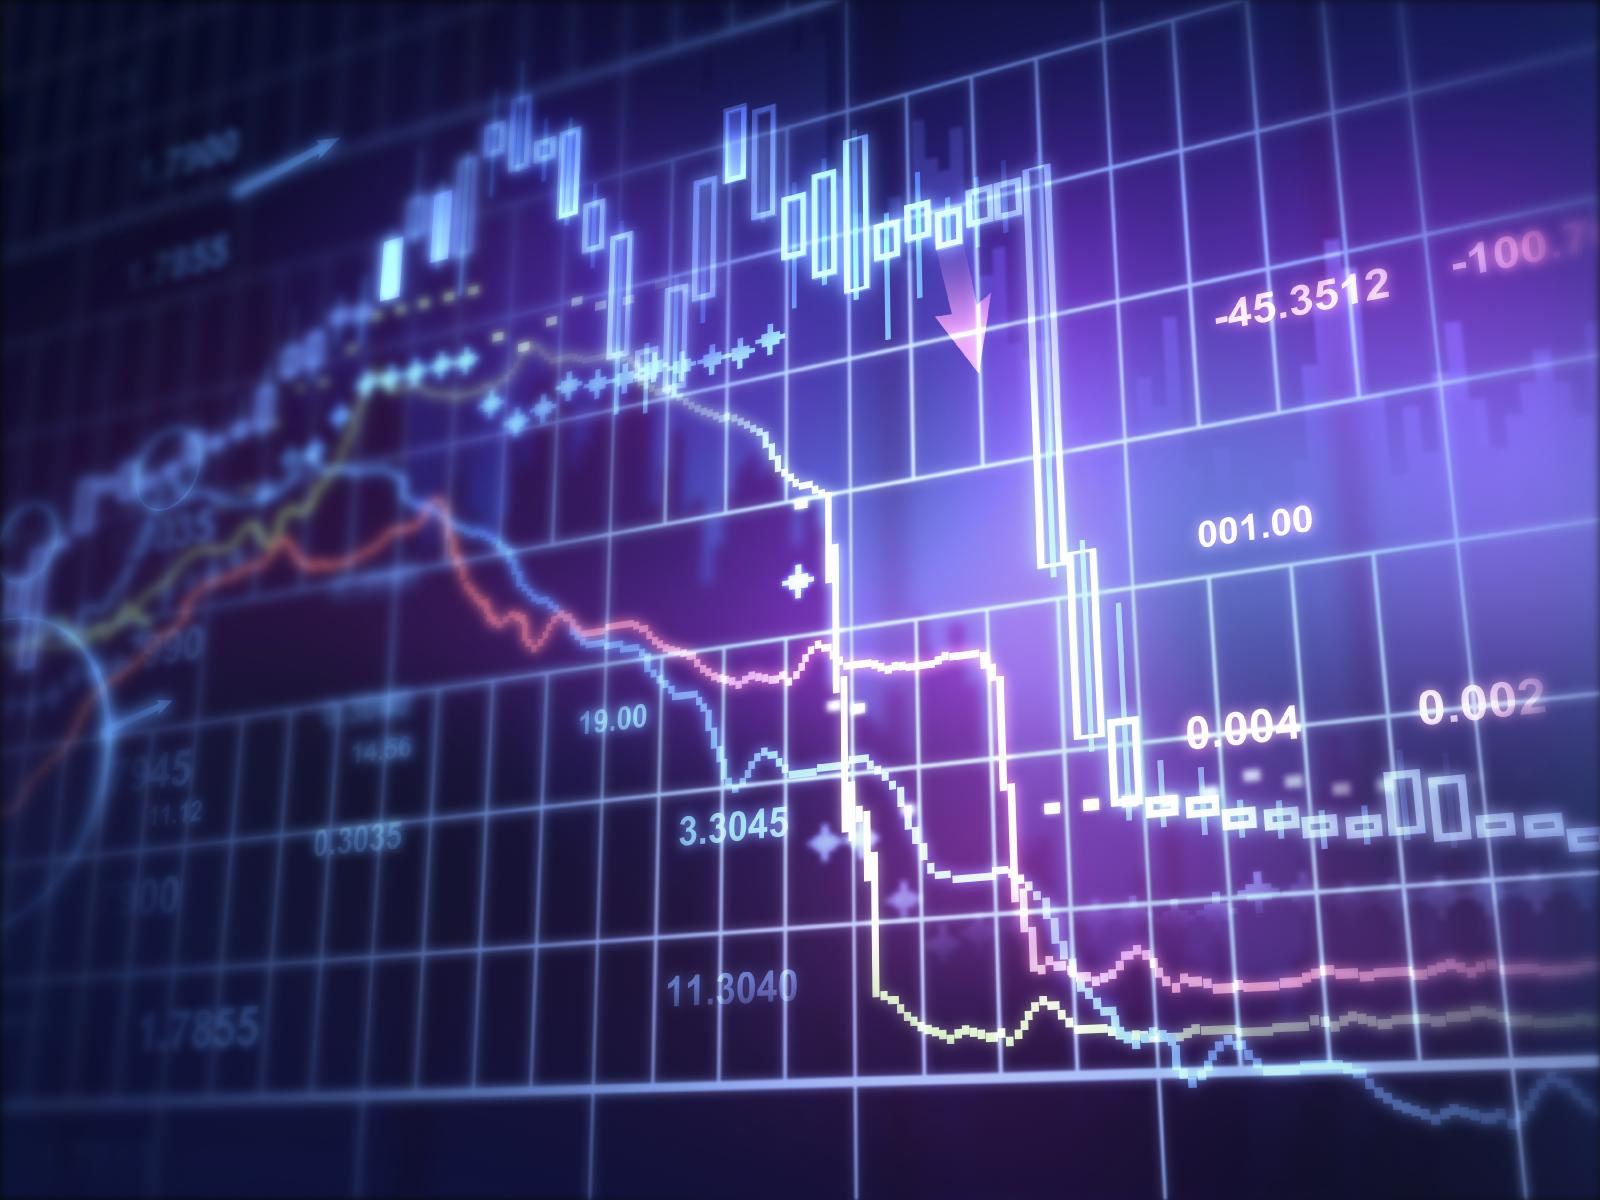 Трейдинг forex обои wallpapers технический анализ и форекс прогноз на 15.08.2012 eur/usd